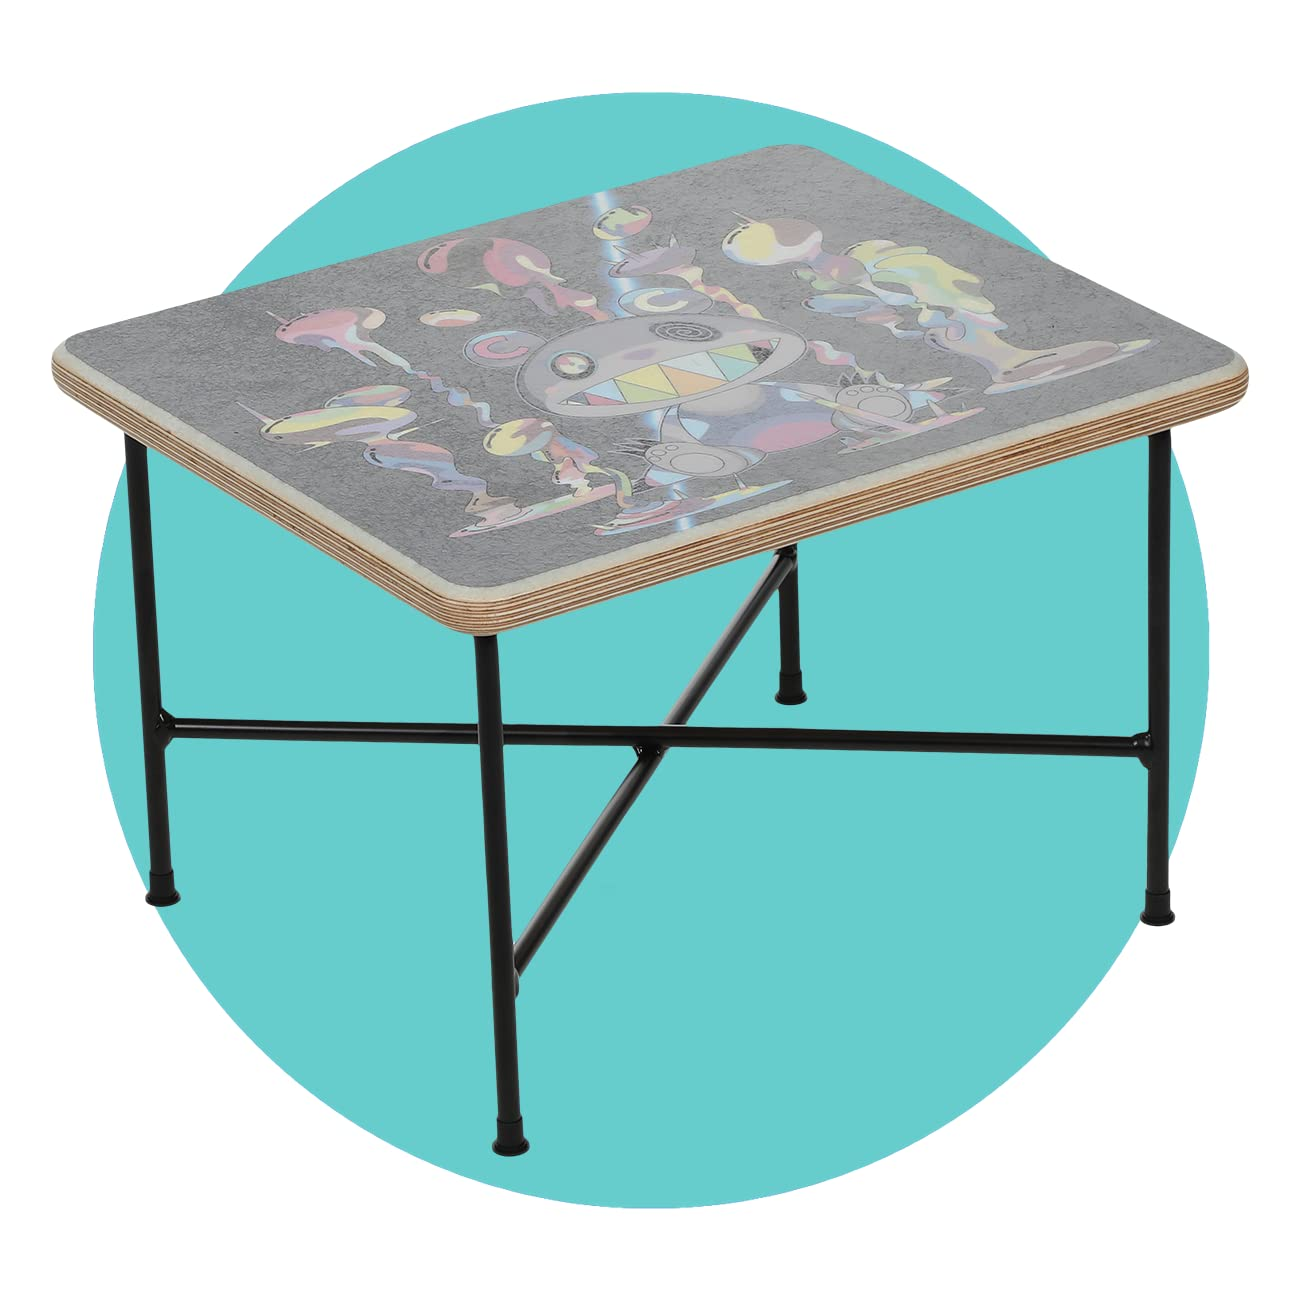 ComplexCon Takashi Murakami x Modernica TMKK Side Table